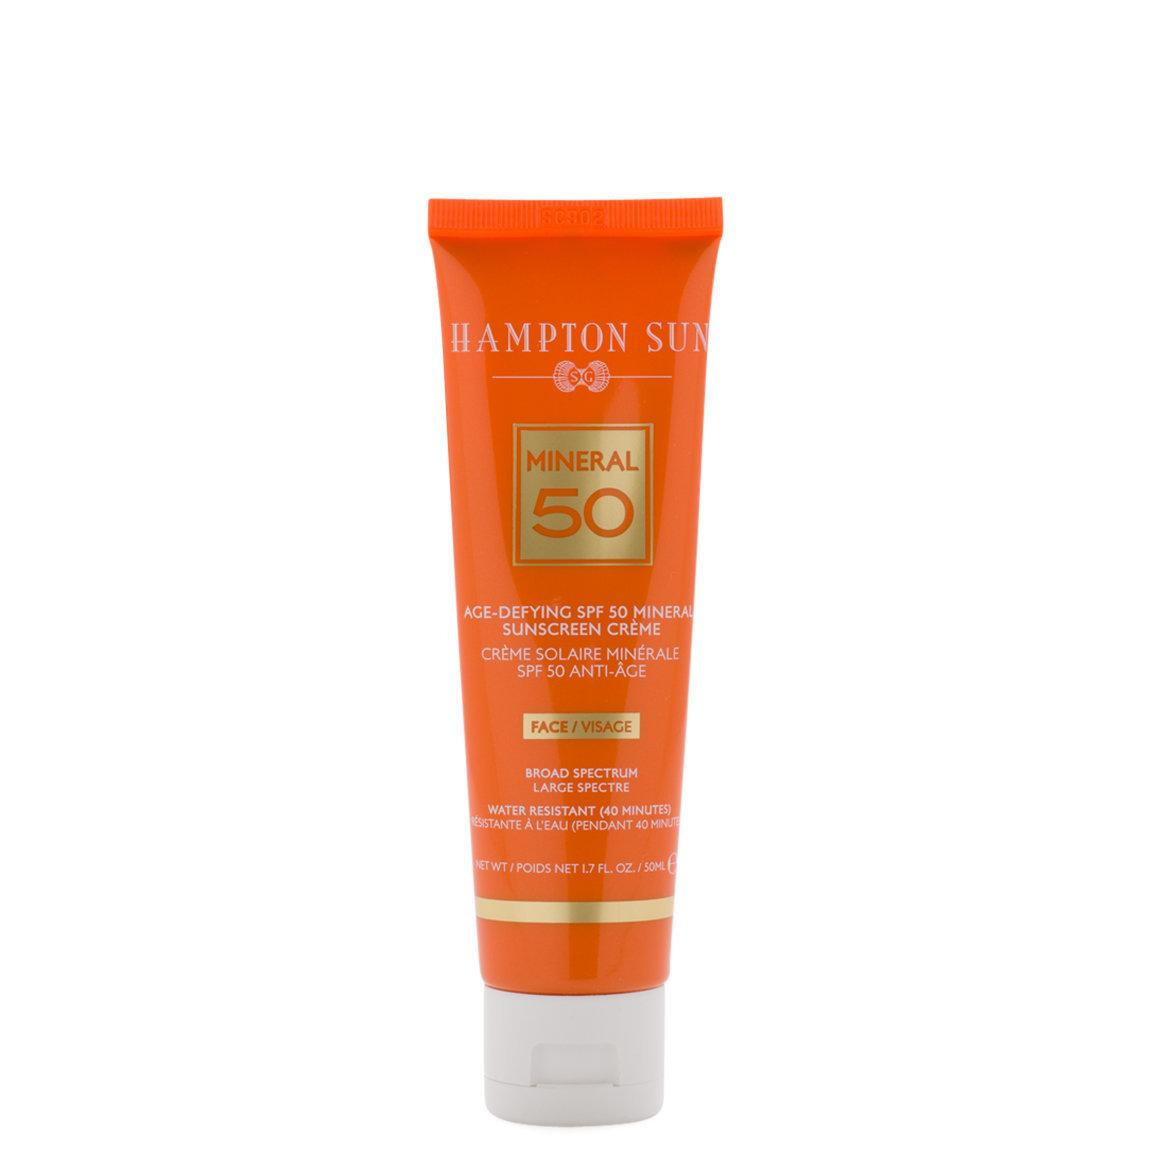 Hampton Sun Age-Defying SPF 50 Mineral Sunscreen Crème product swatch.